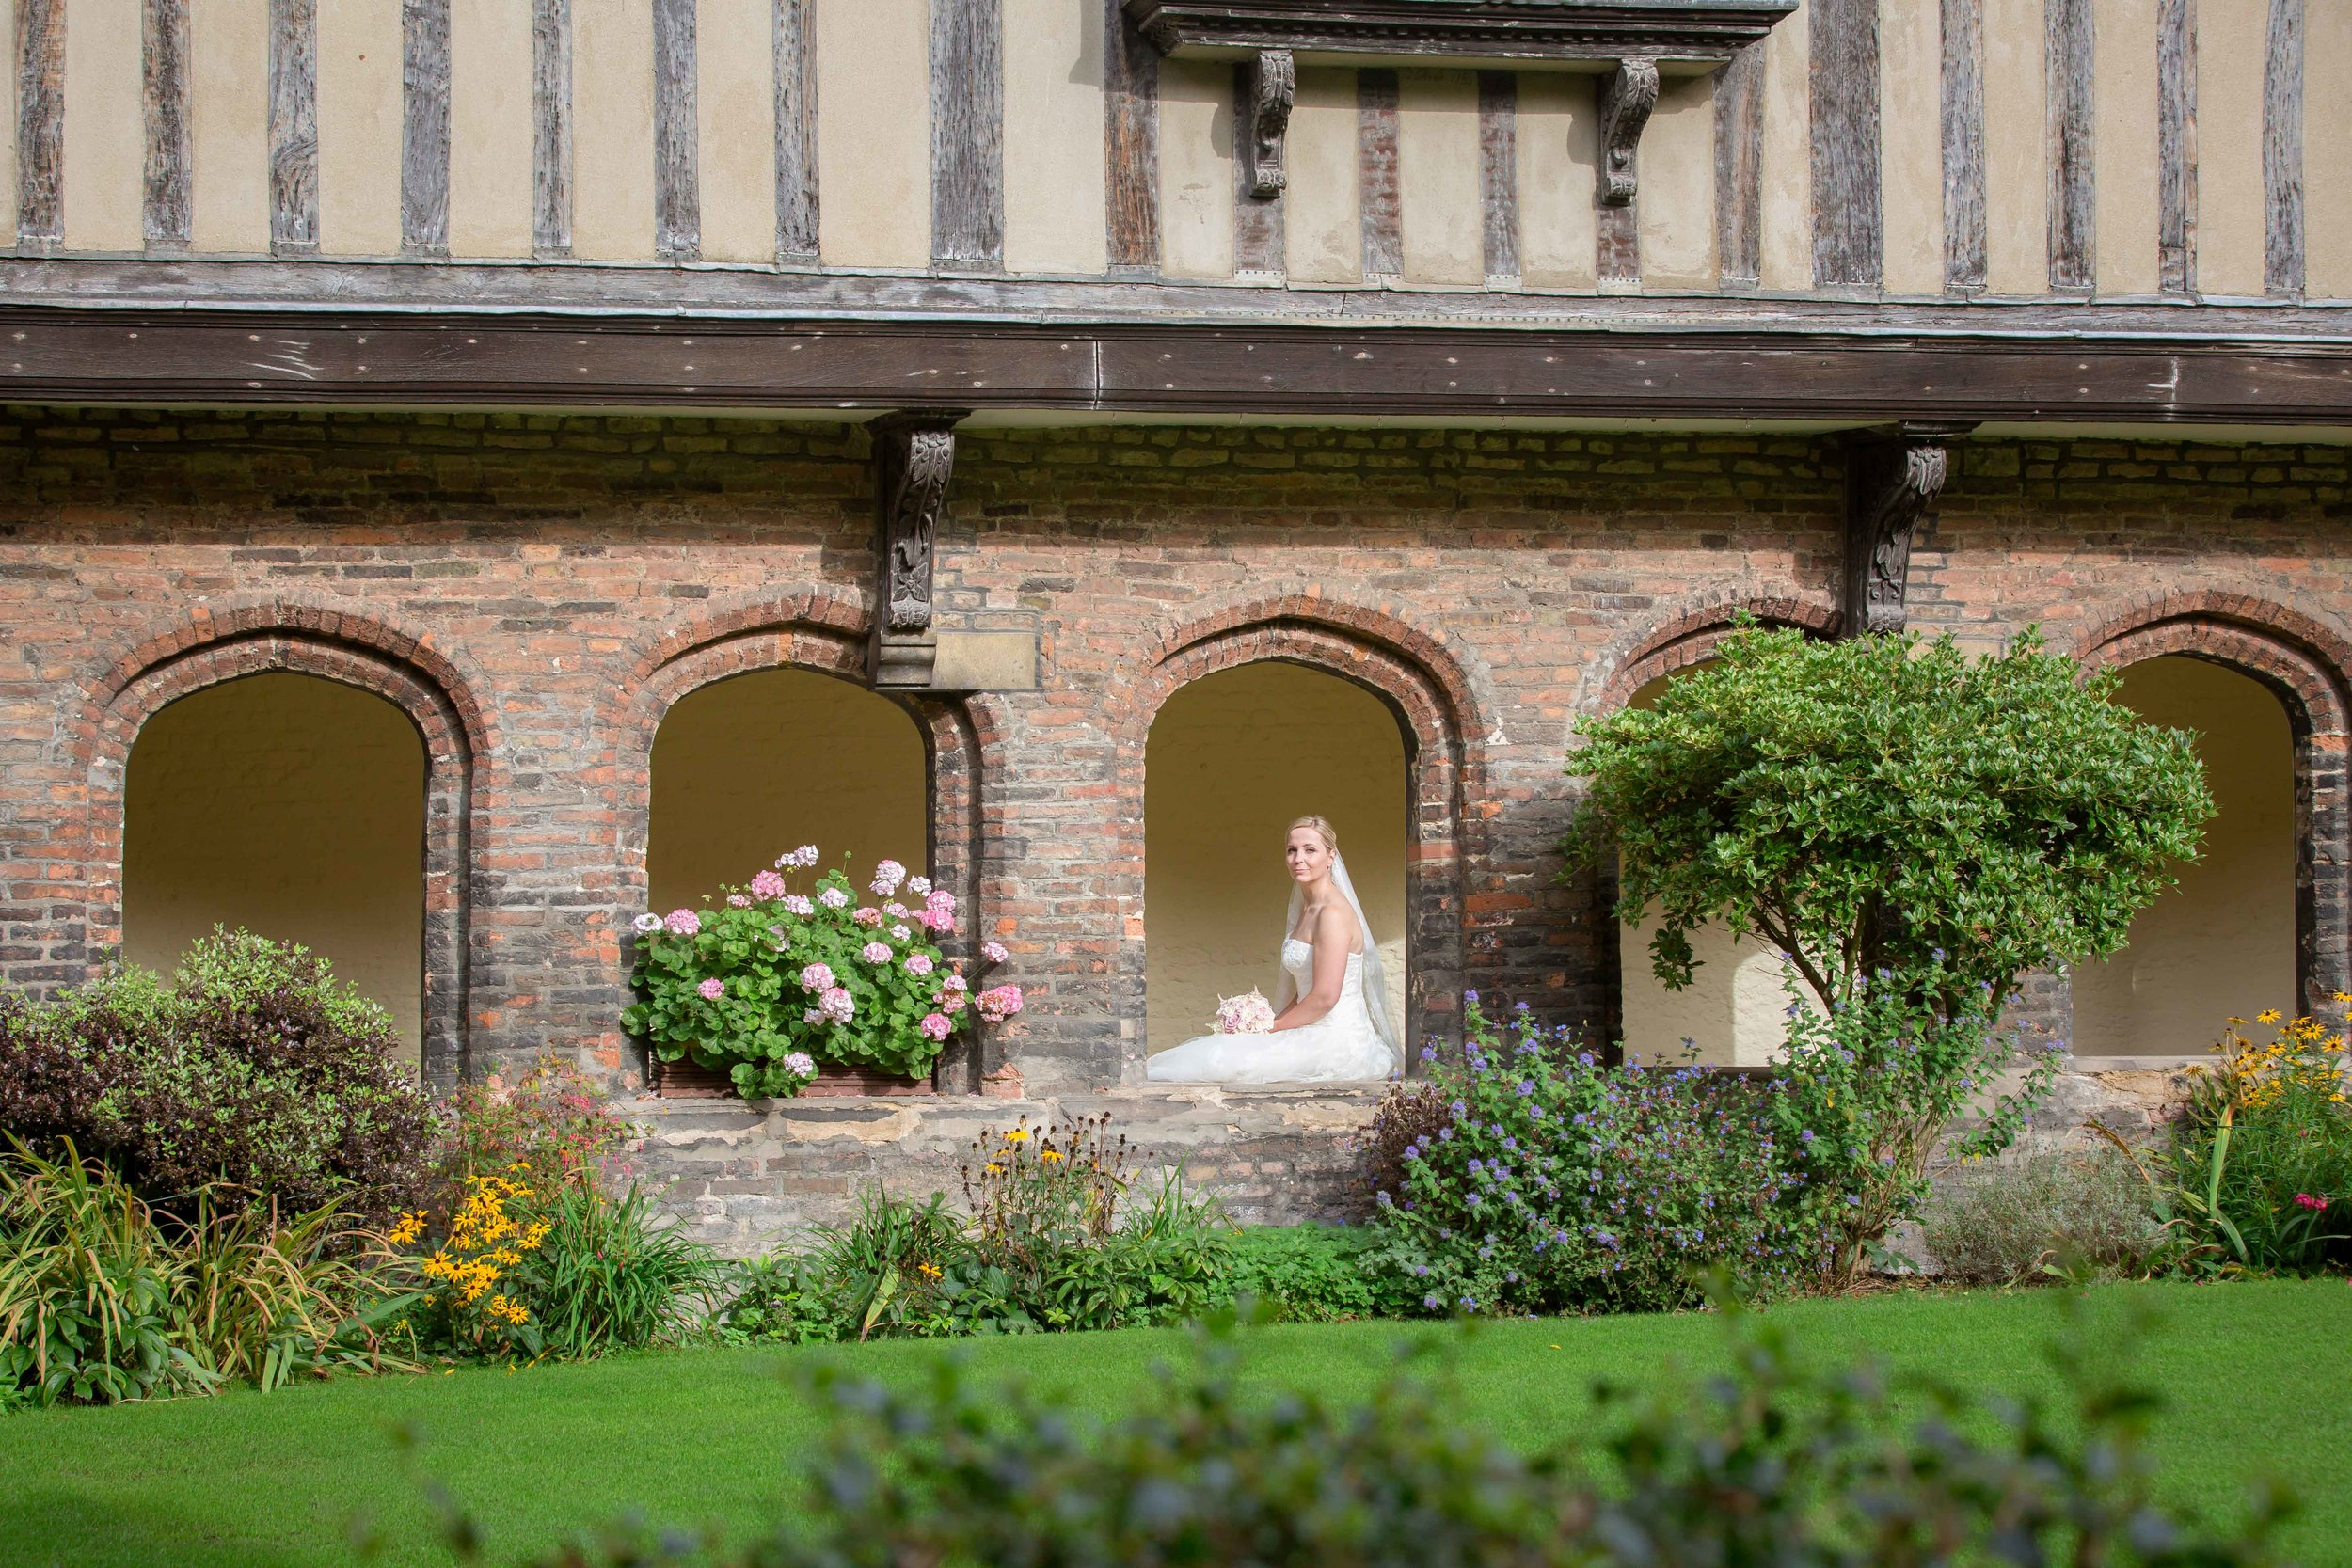 Adrian_Nicole_Charnwood_Weddings_Queens_College_Cambridge-1009.jpg